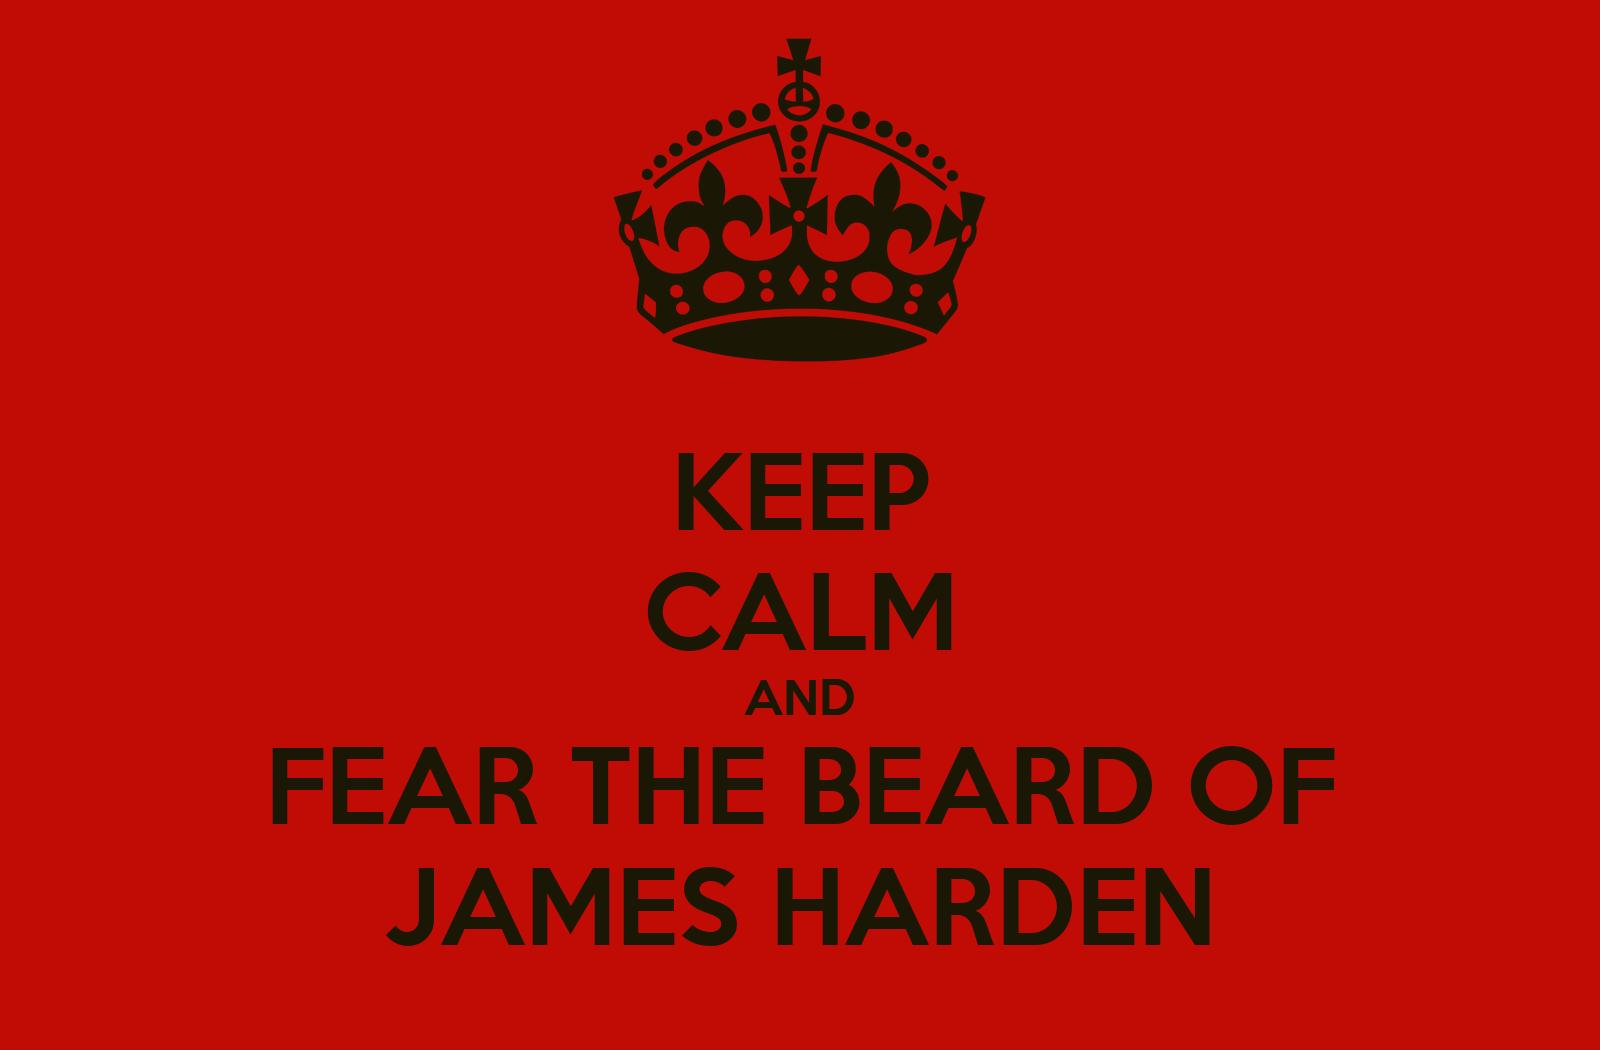 James harden fear the beard logo - photo#15